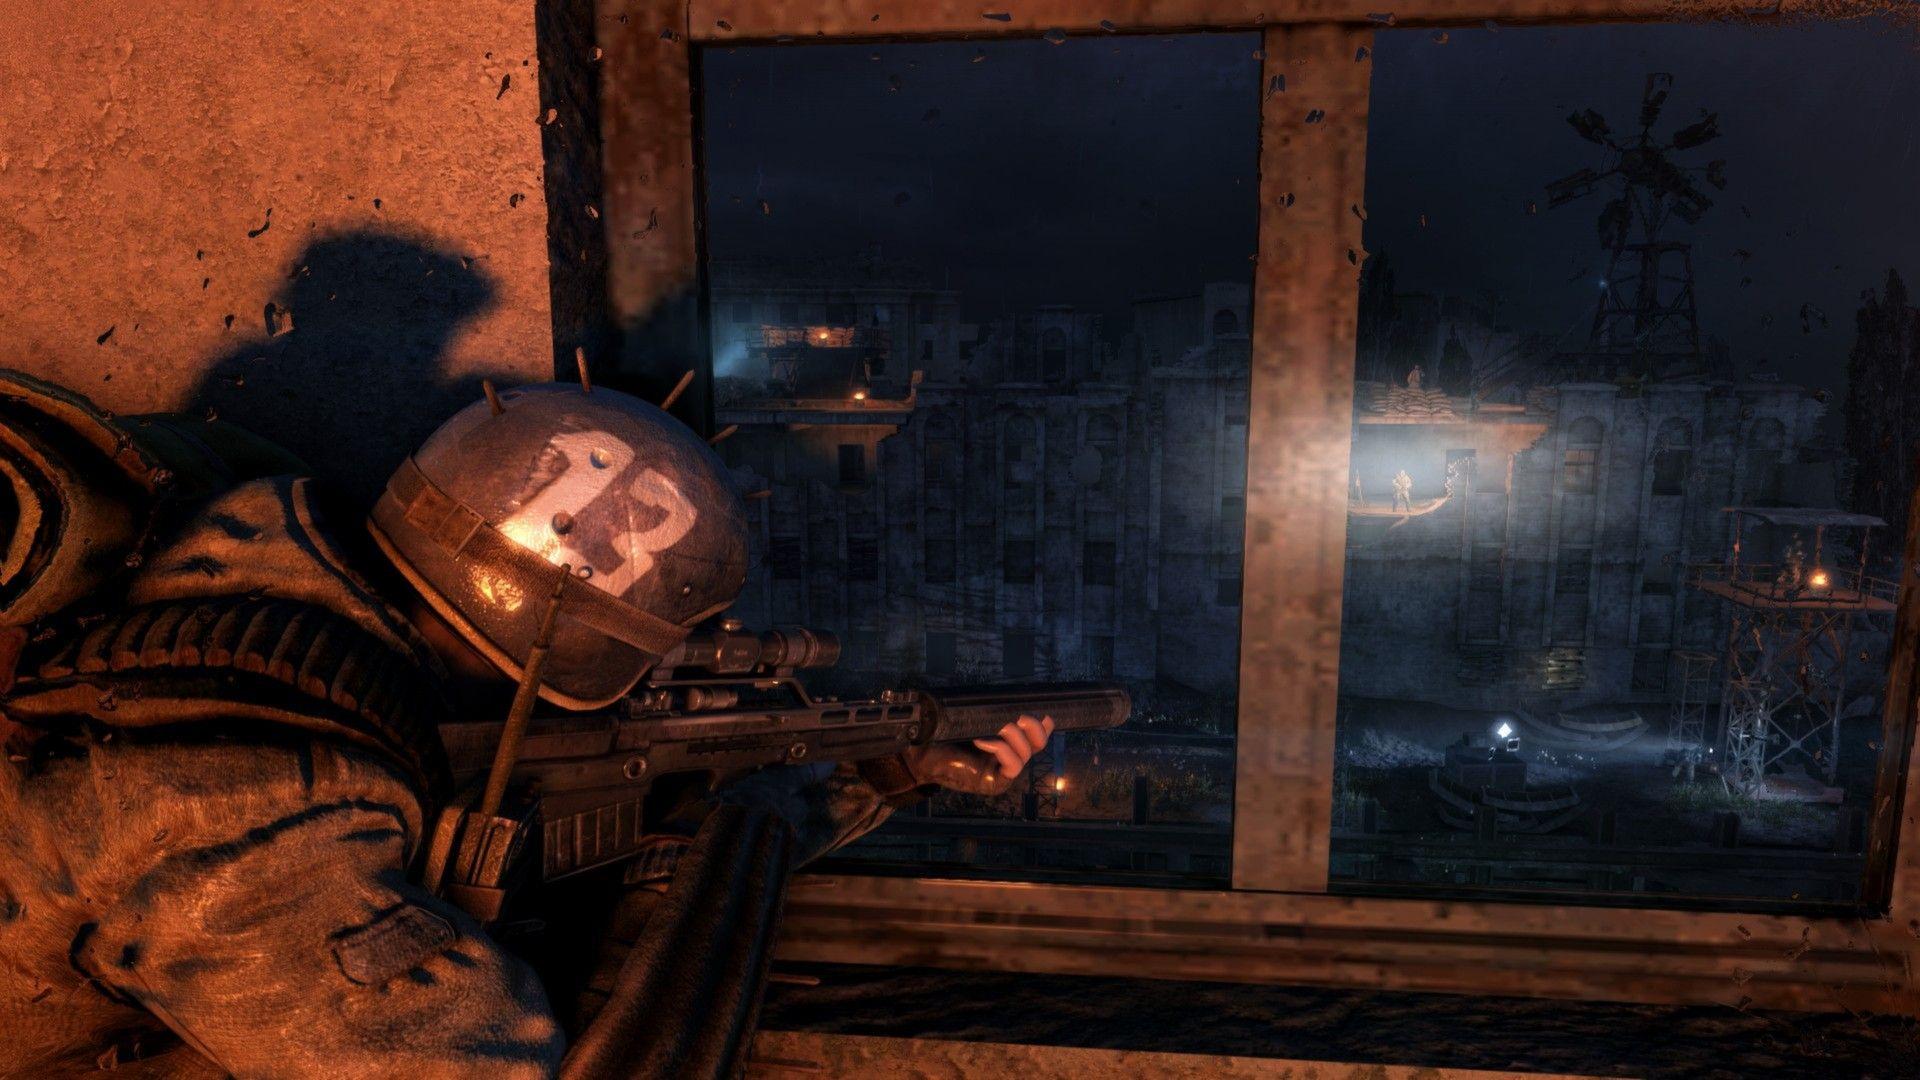 Metro 2033 and Metro: Last Light